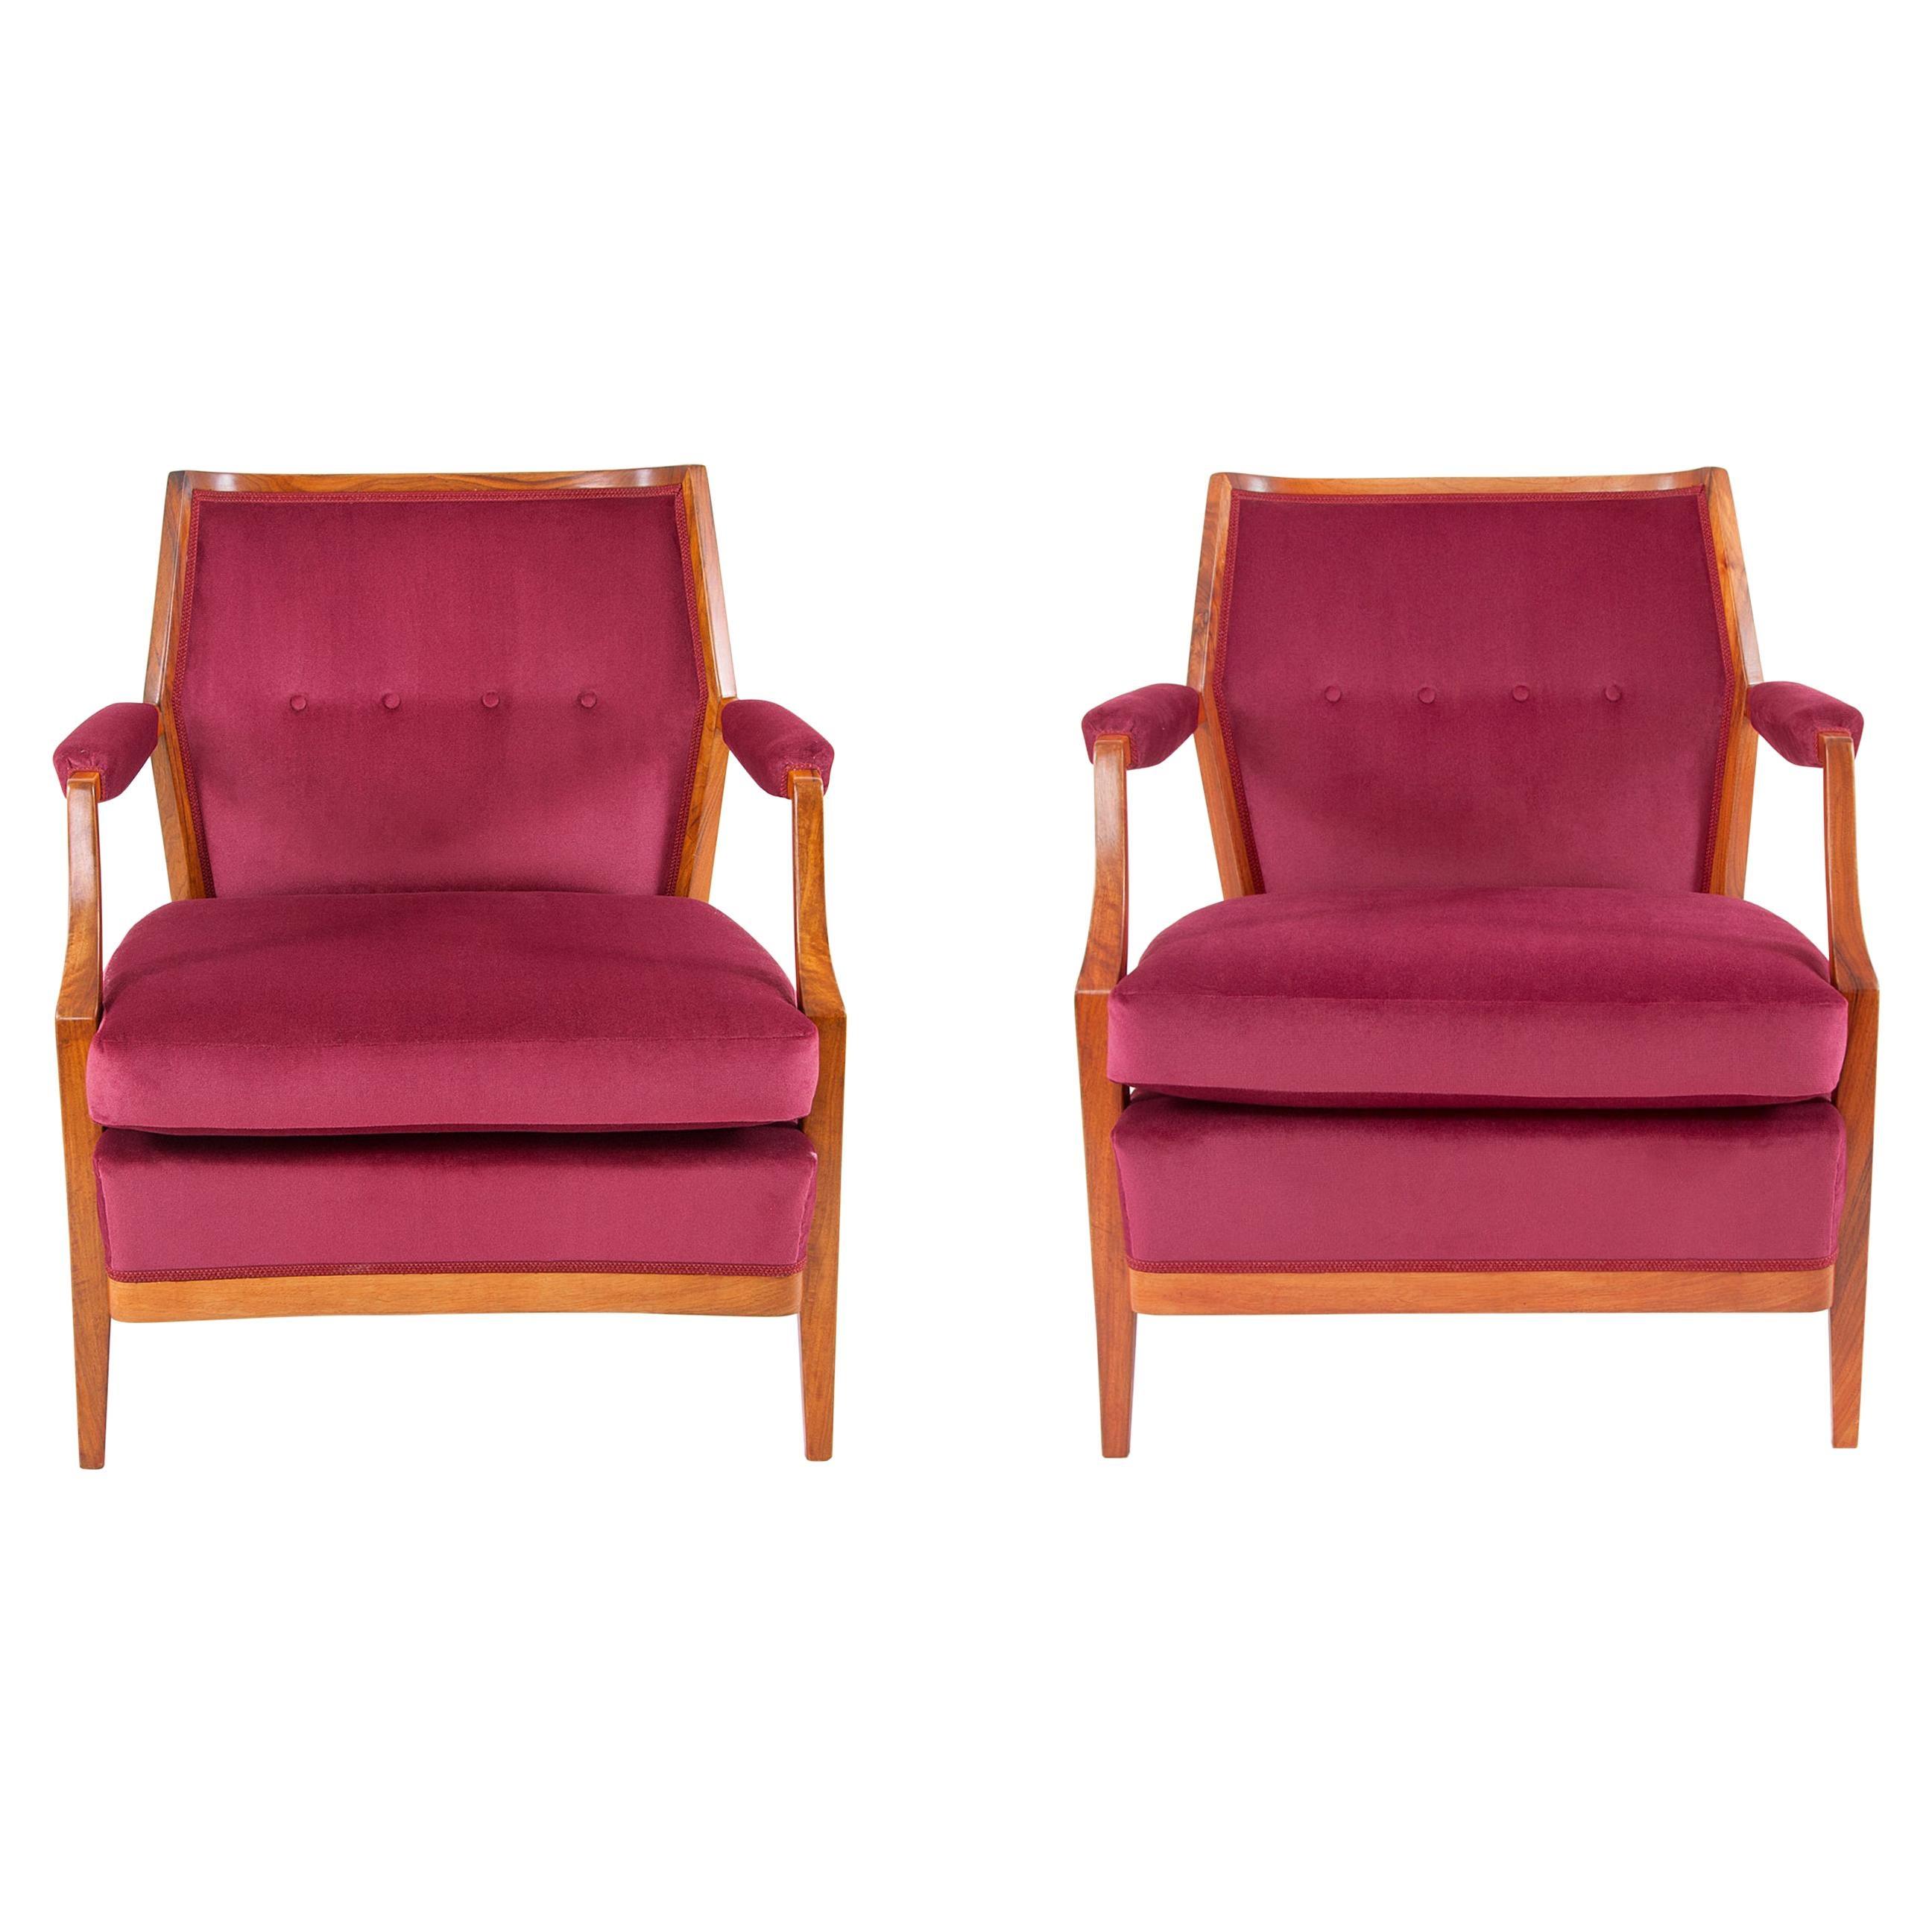 One Austrian Midcentury Walnut Embassy Club Chairs, Velvet Upholstery, 1950s